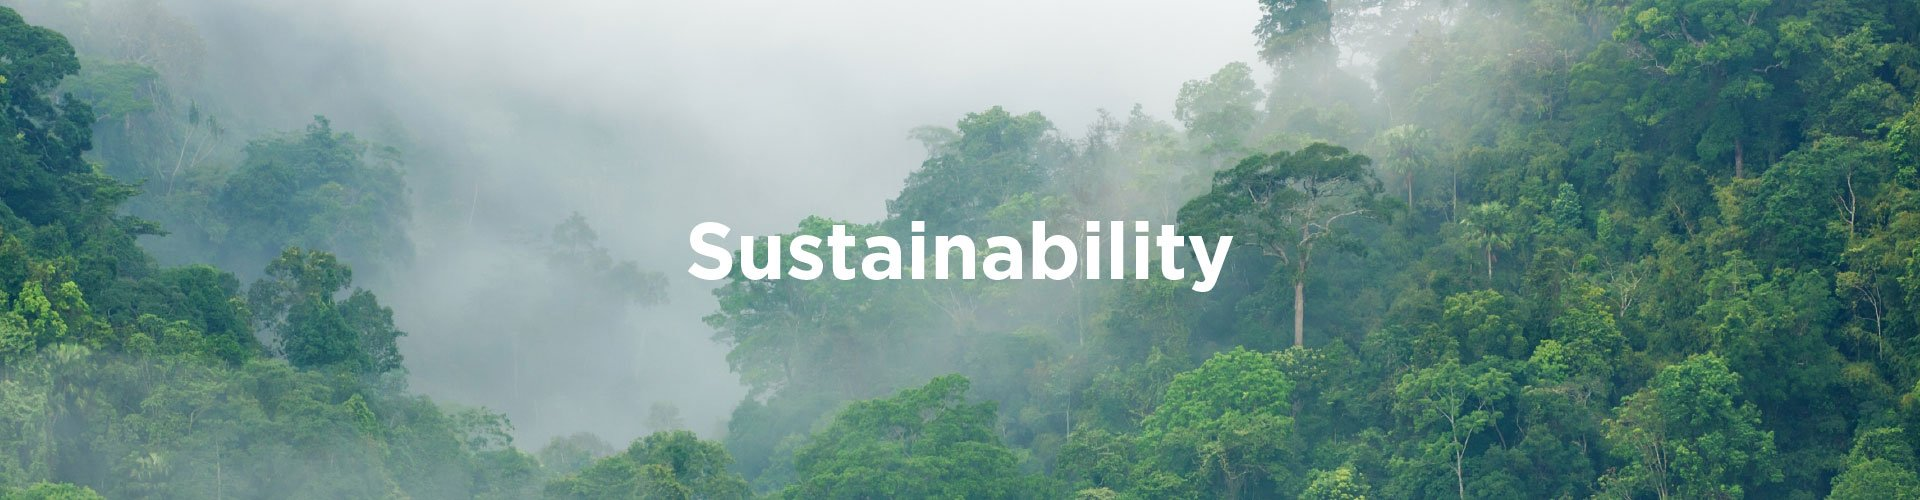 Sustainability_banner